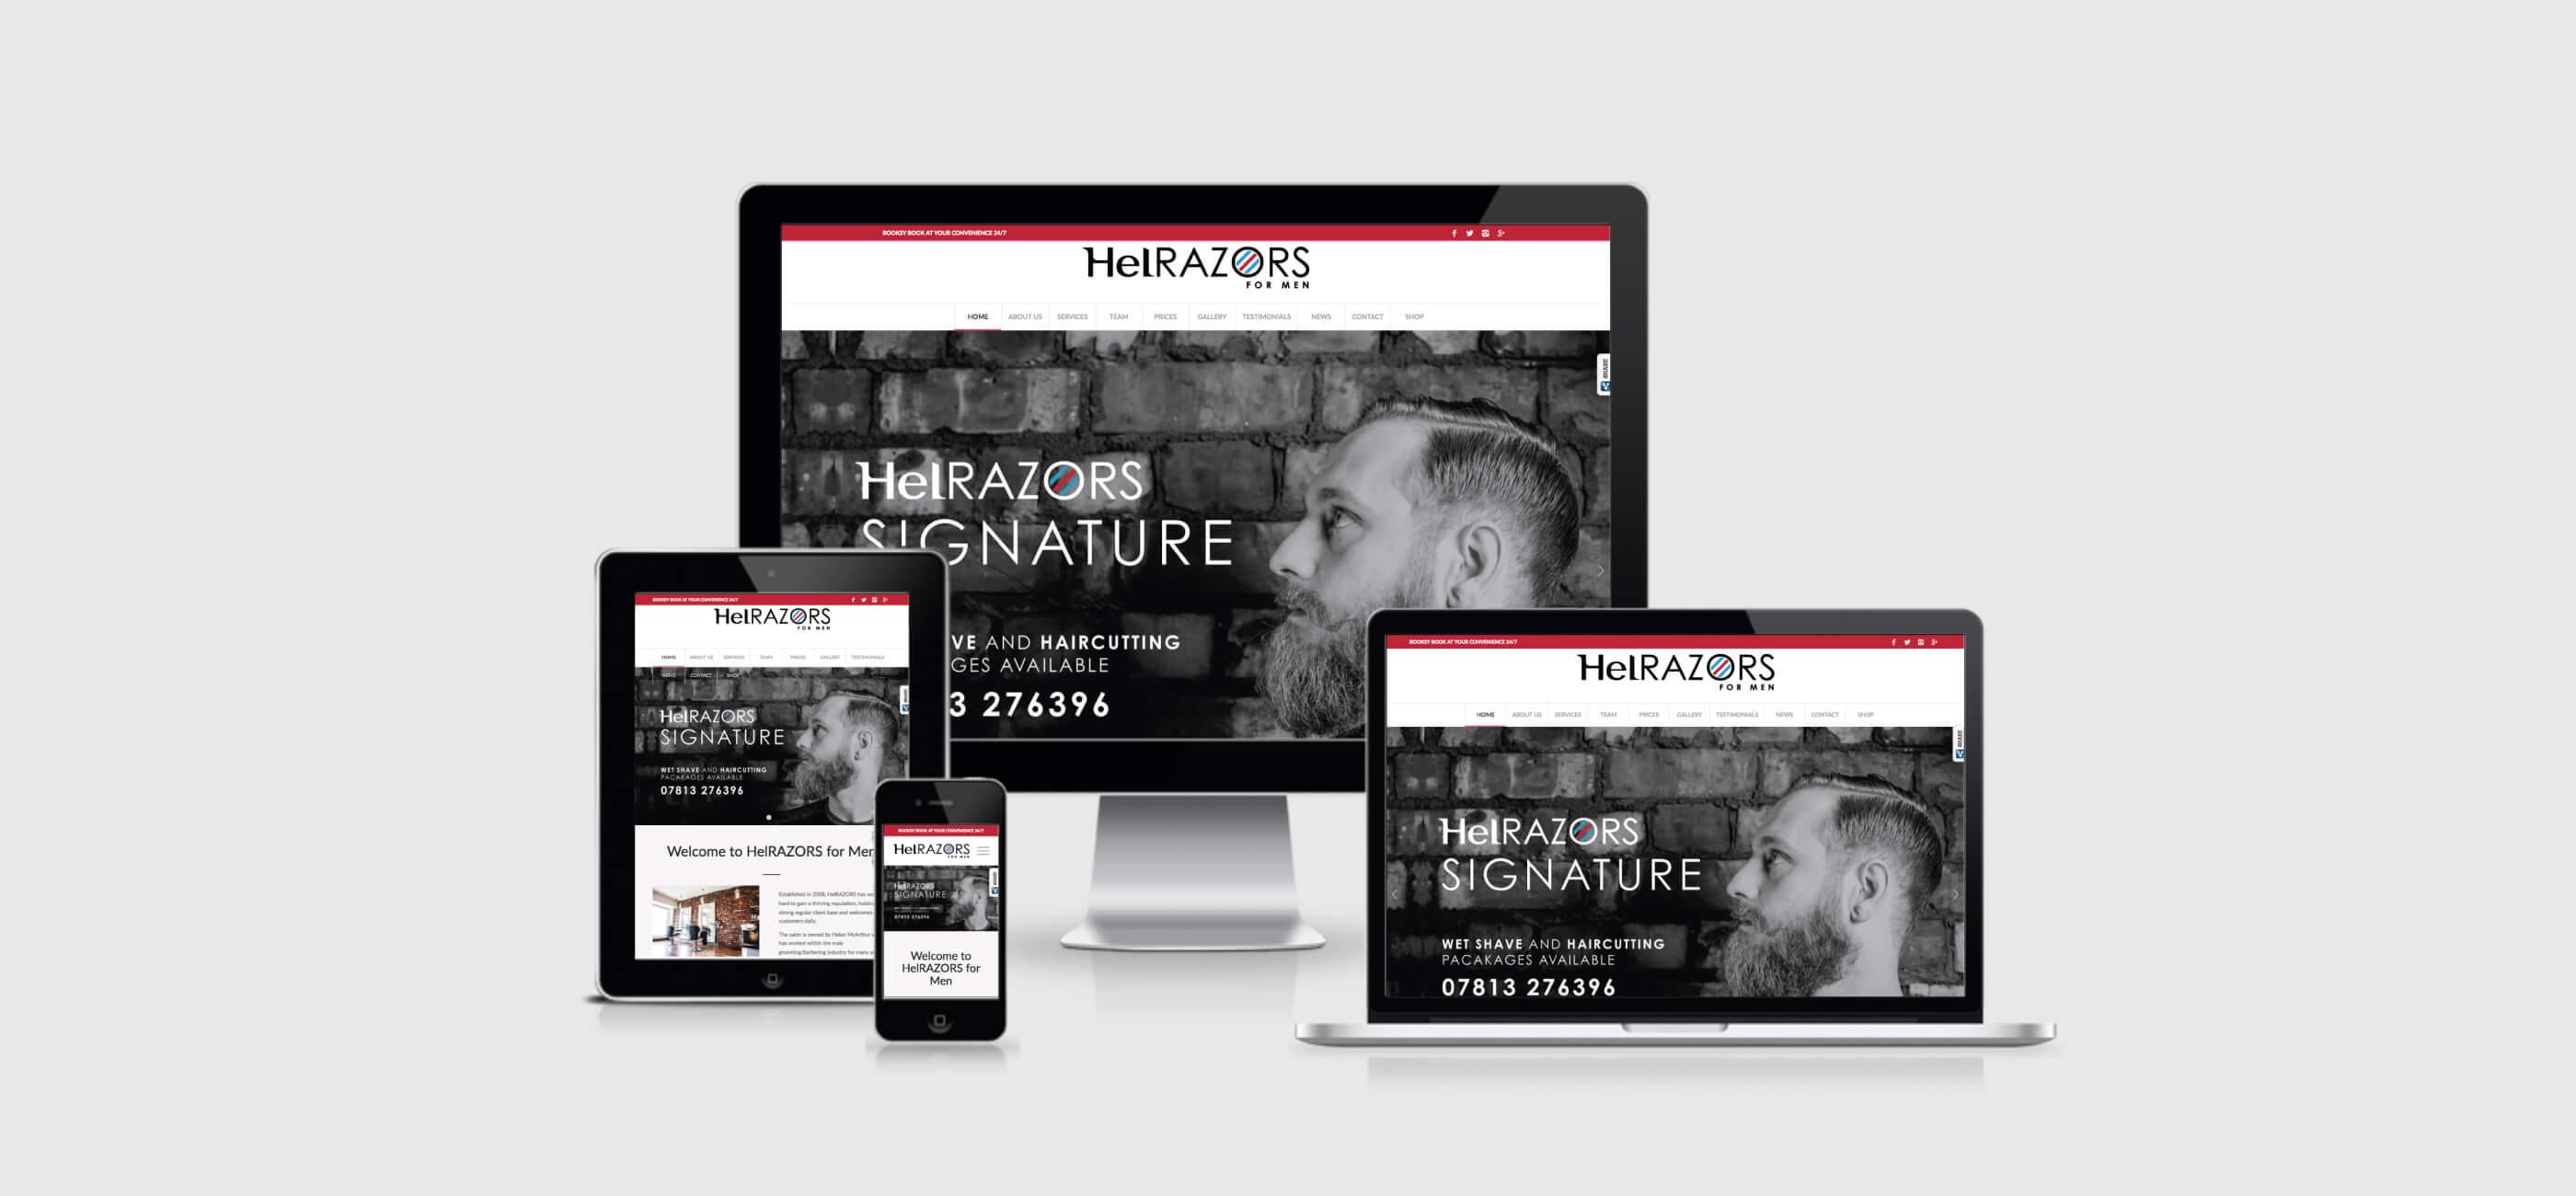 HelRAZORS Web Responsive presentation